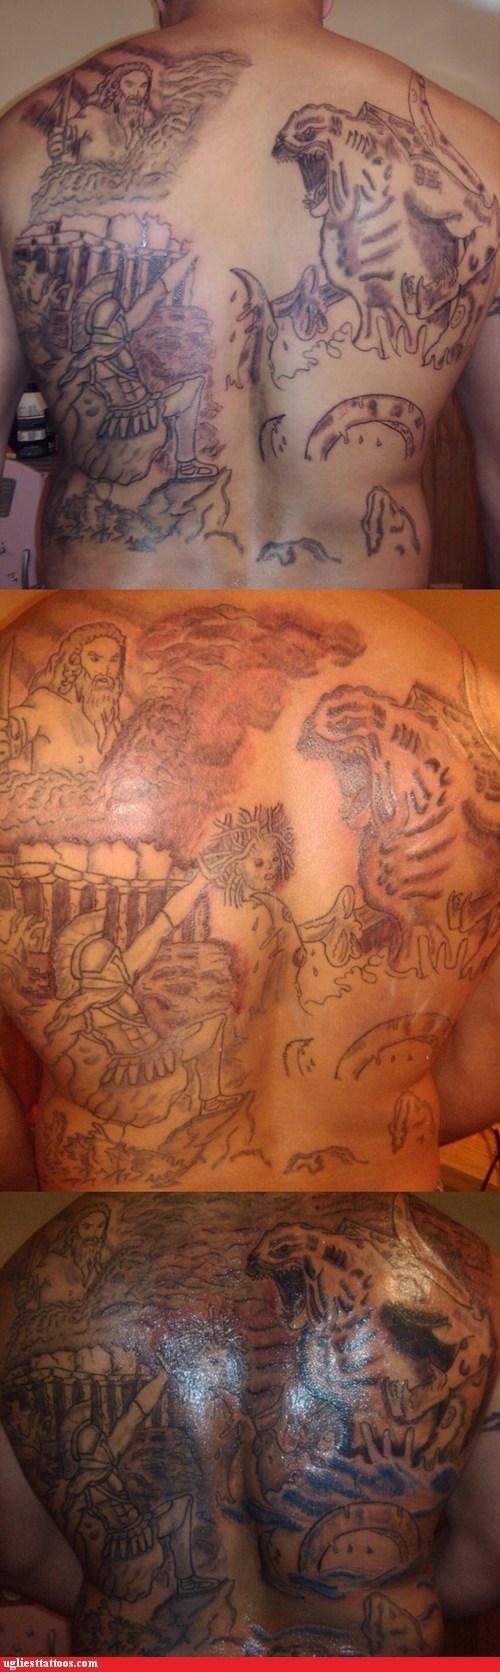 clash of the titans,godzilla,back tattoos